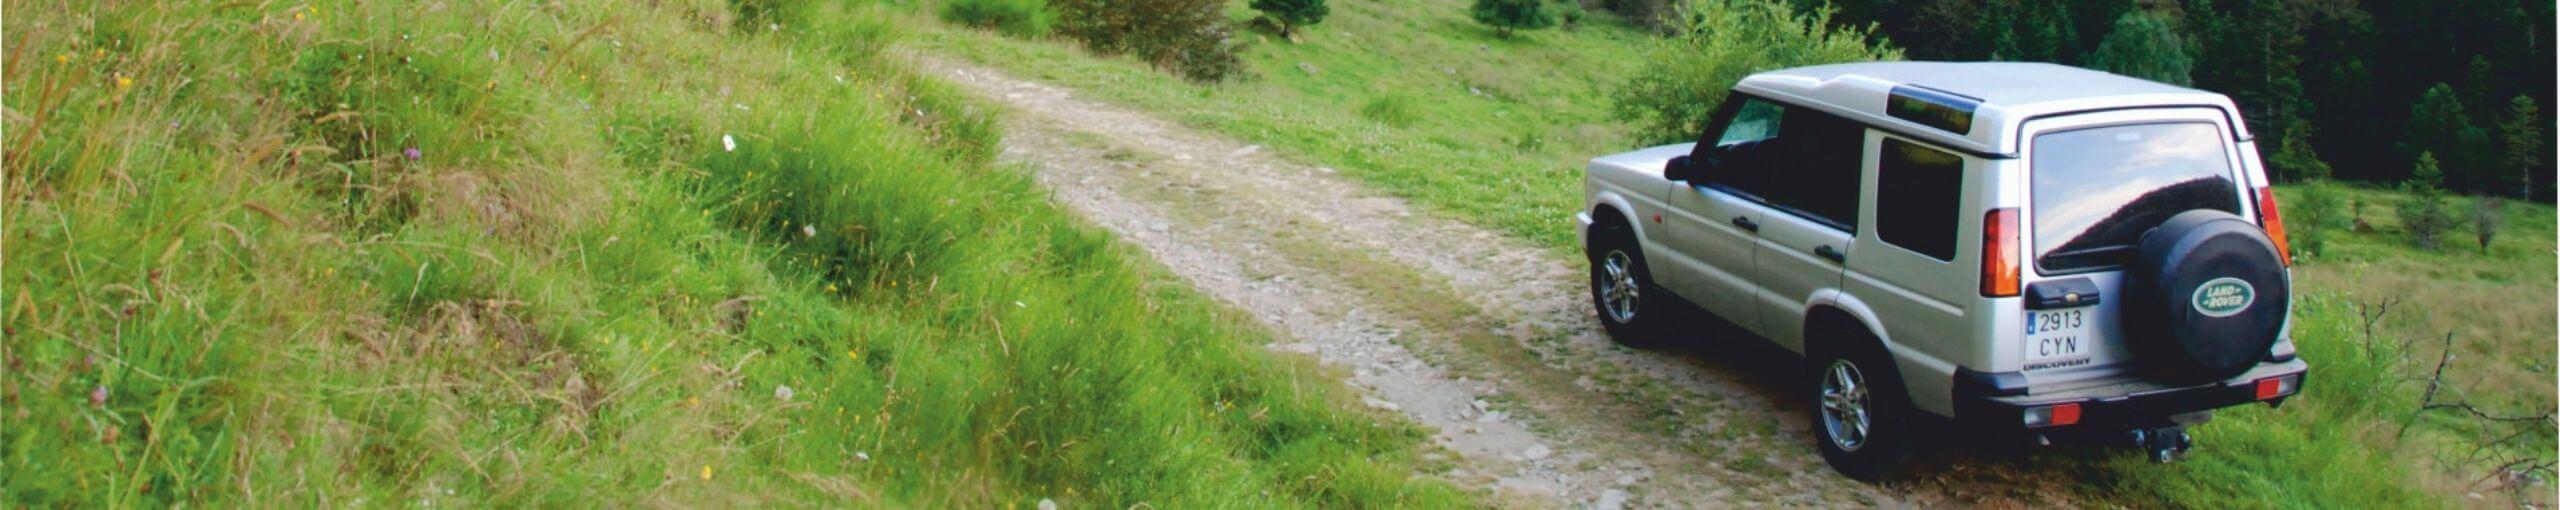 Ruta 4X4 Valle de Torán san joan de Torán, Lérida. Cataluña.